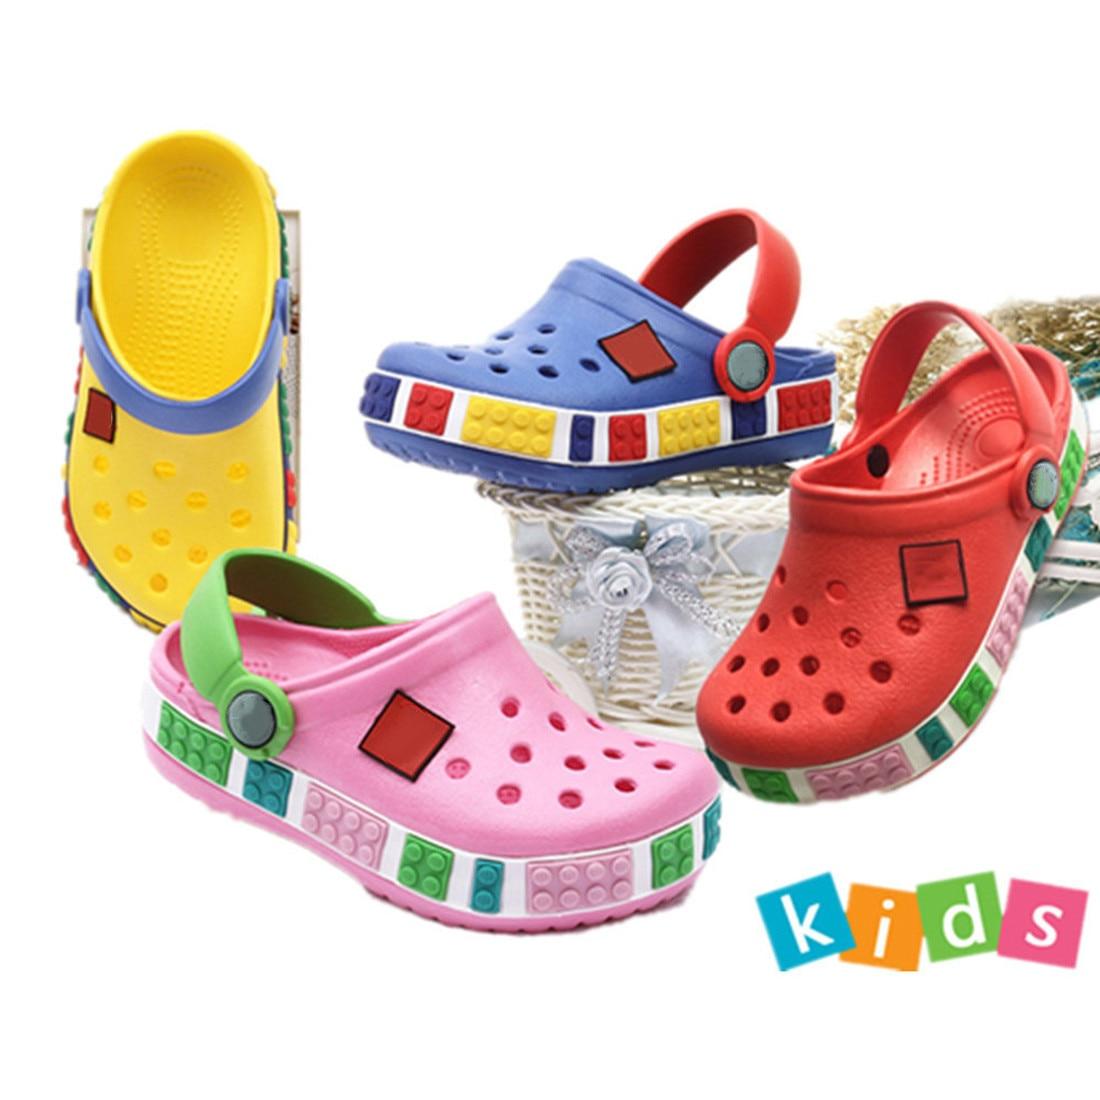 2019 Summer Toddler Boy Girls Beach Slippers Children Sandals 3D Cartoon Cave Kids Shoes EVA Resistance Breathable Antislip Baby